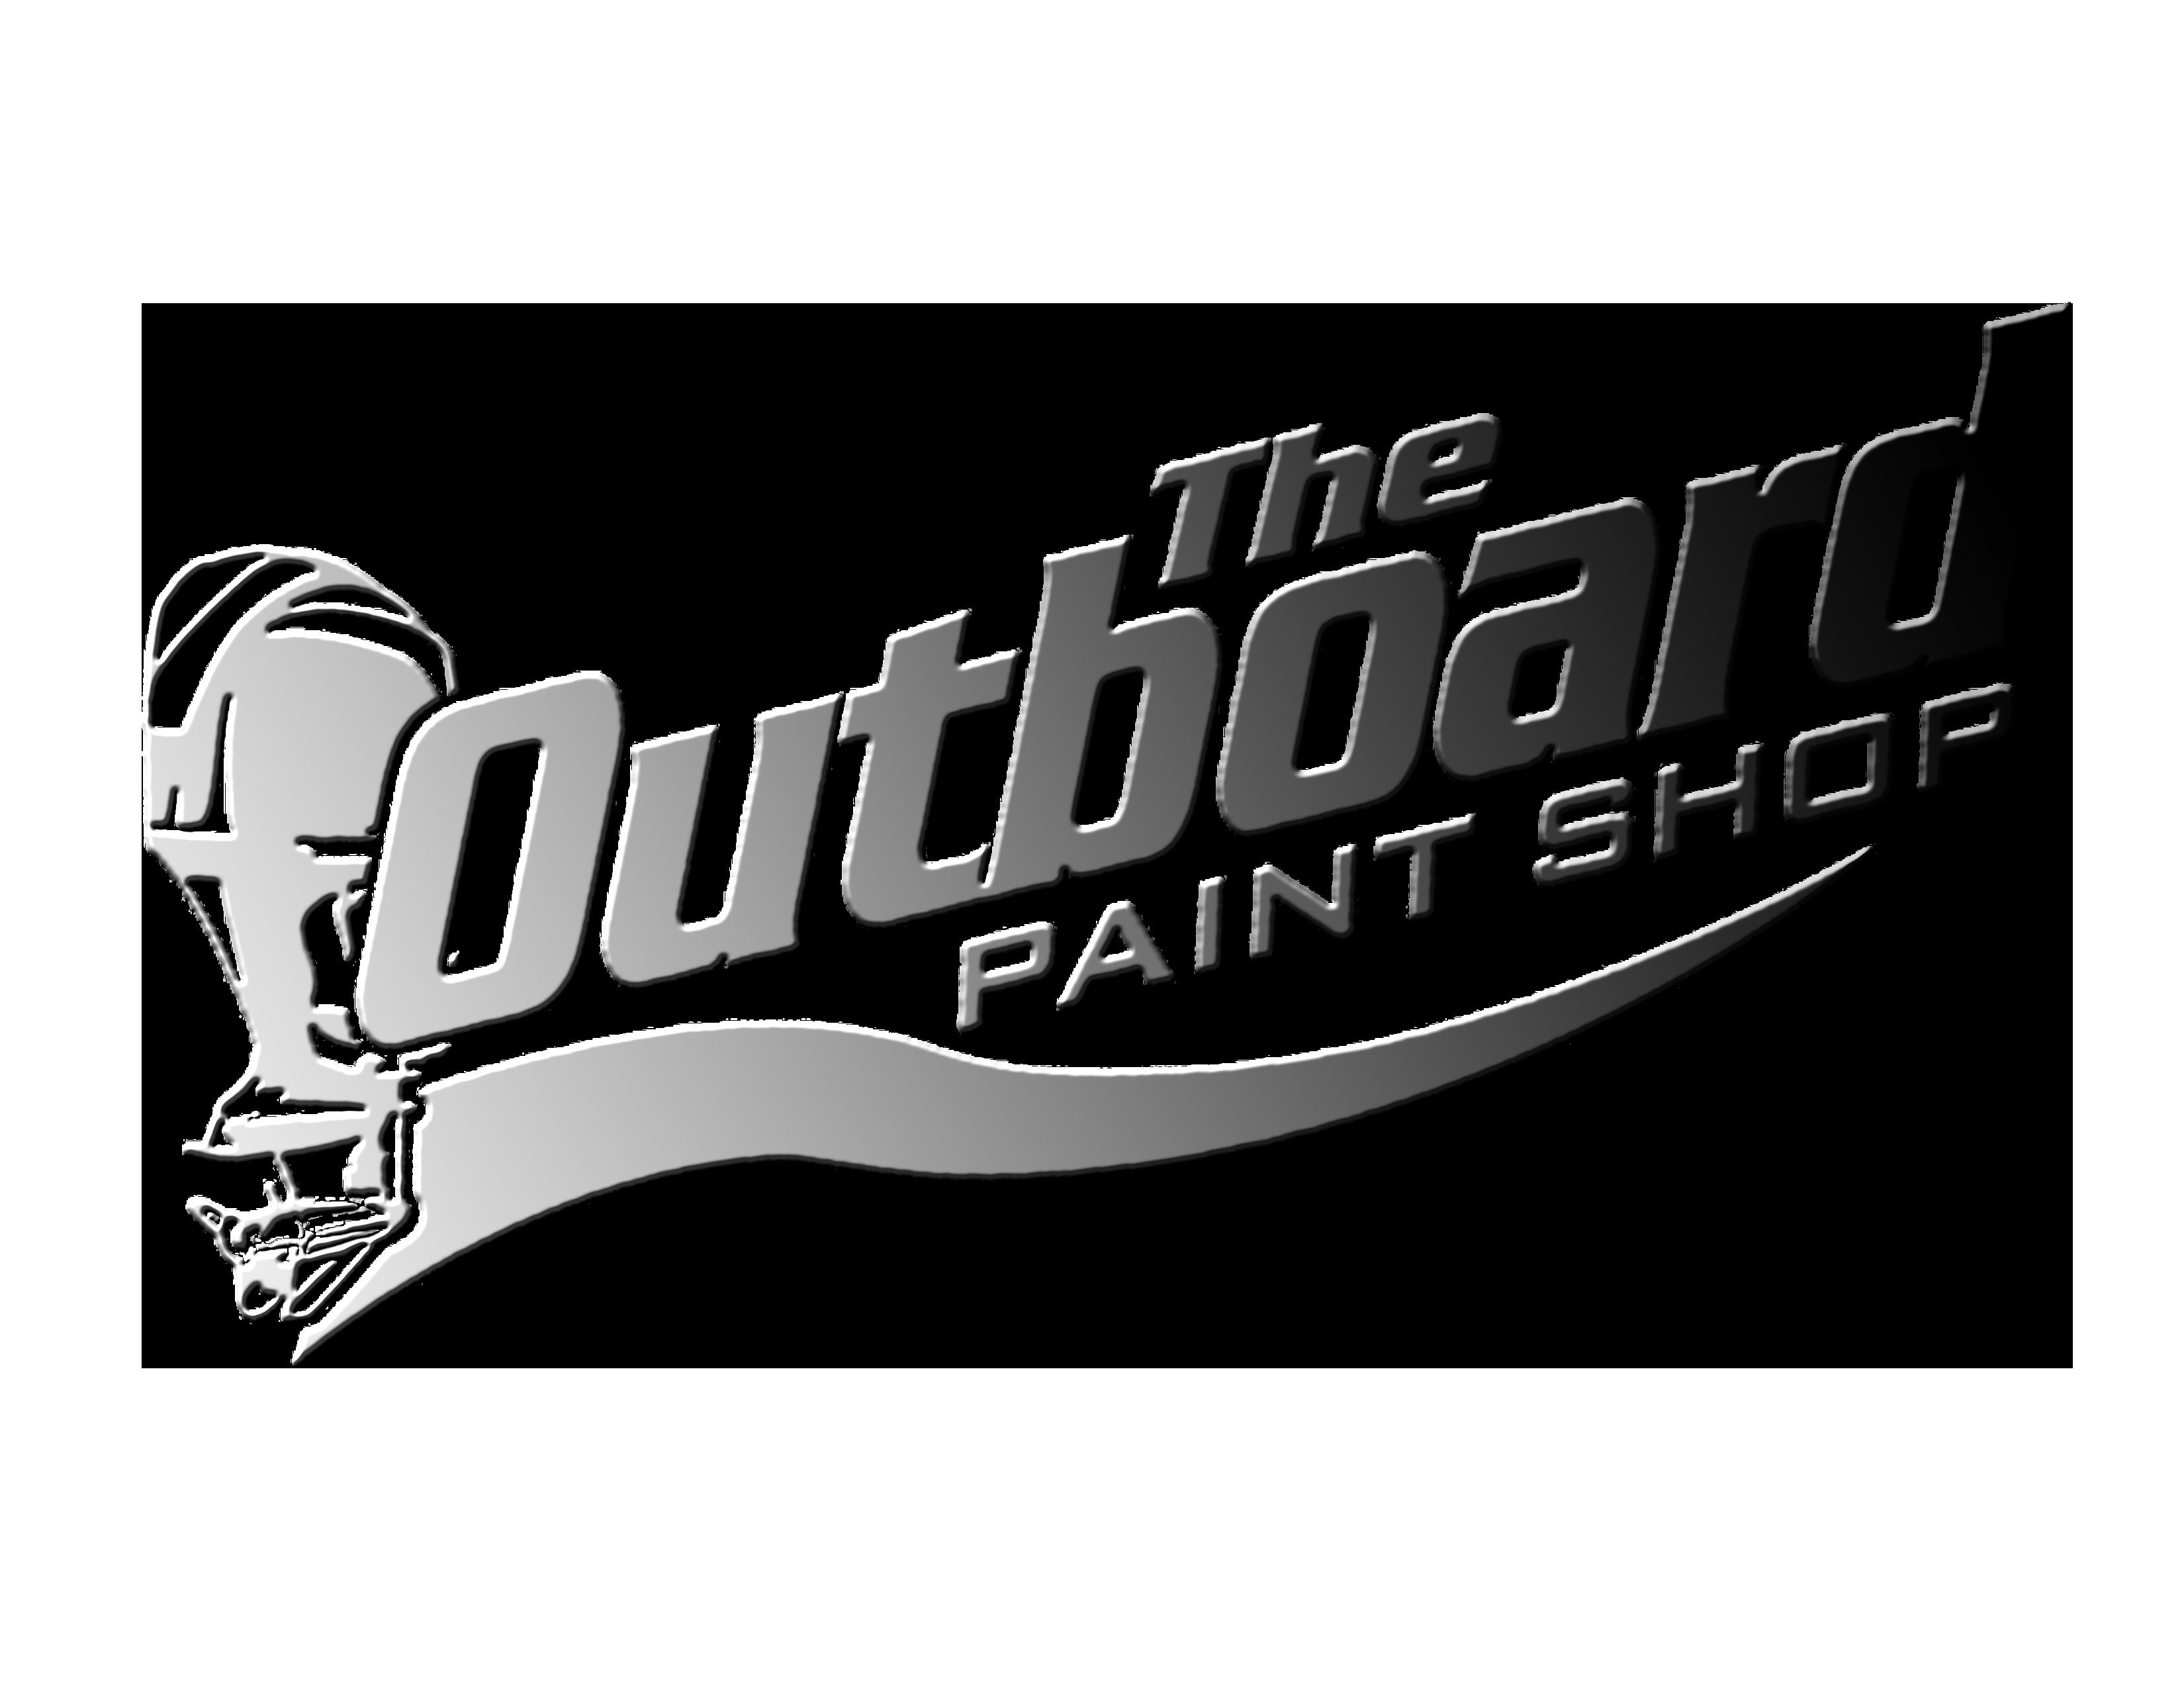 yamaha outboard paint. using factory original colors and decals for yamaha, mercury, honda, suzuki, johnson, evinrude, mariner \u0026 tohatzu. we can make your outboard look brand new yamaha paint